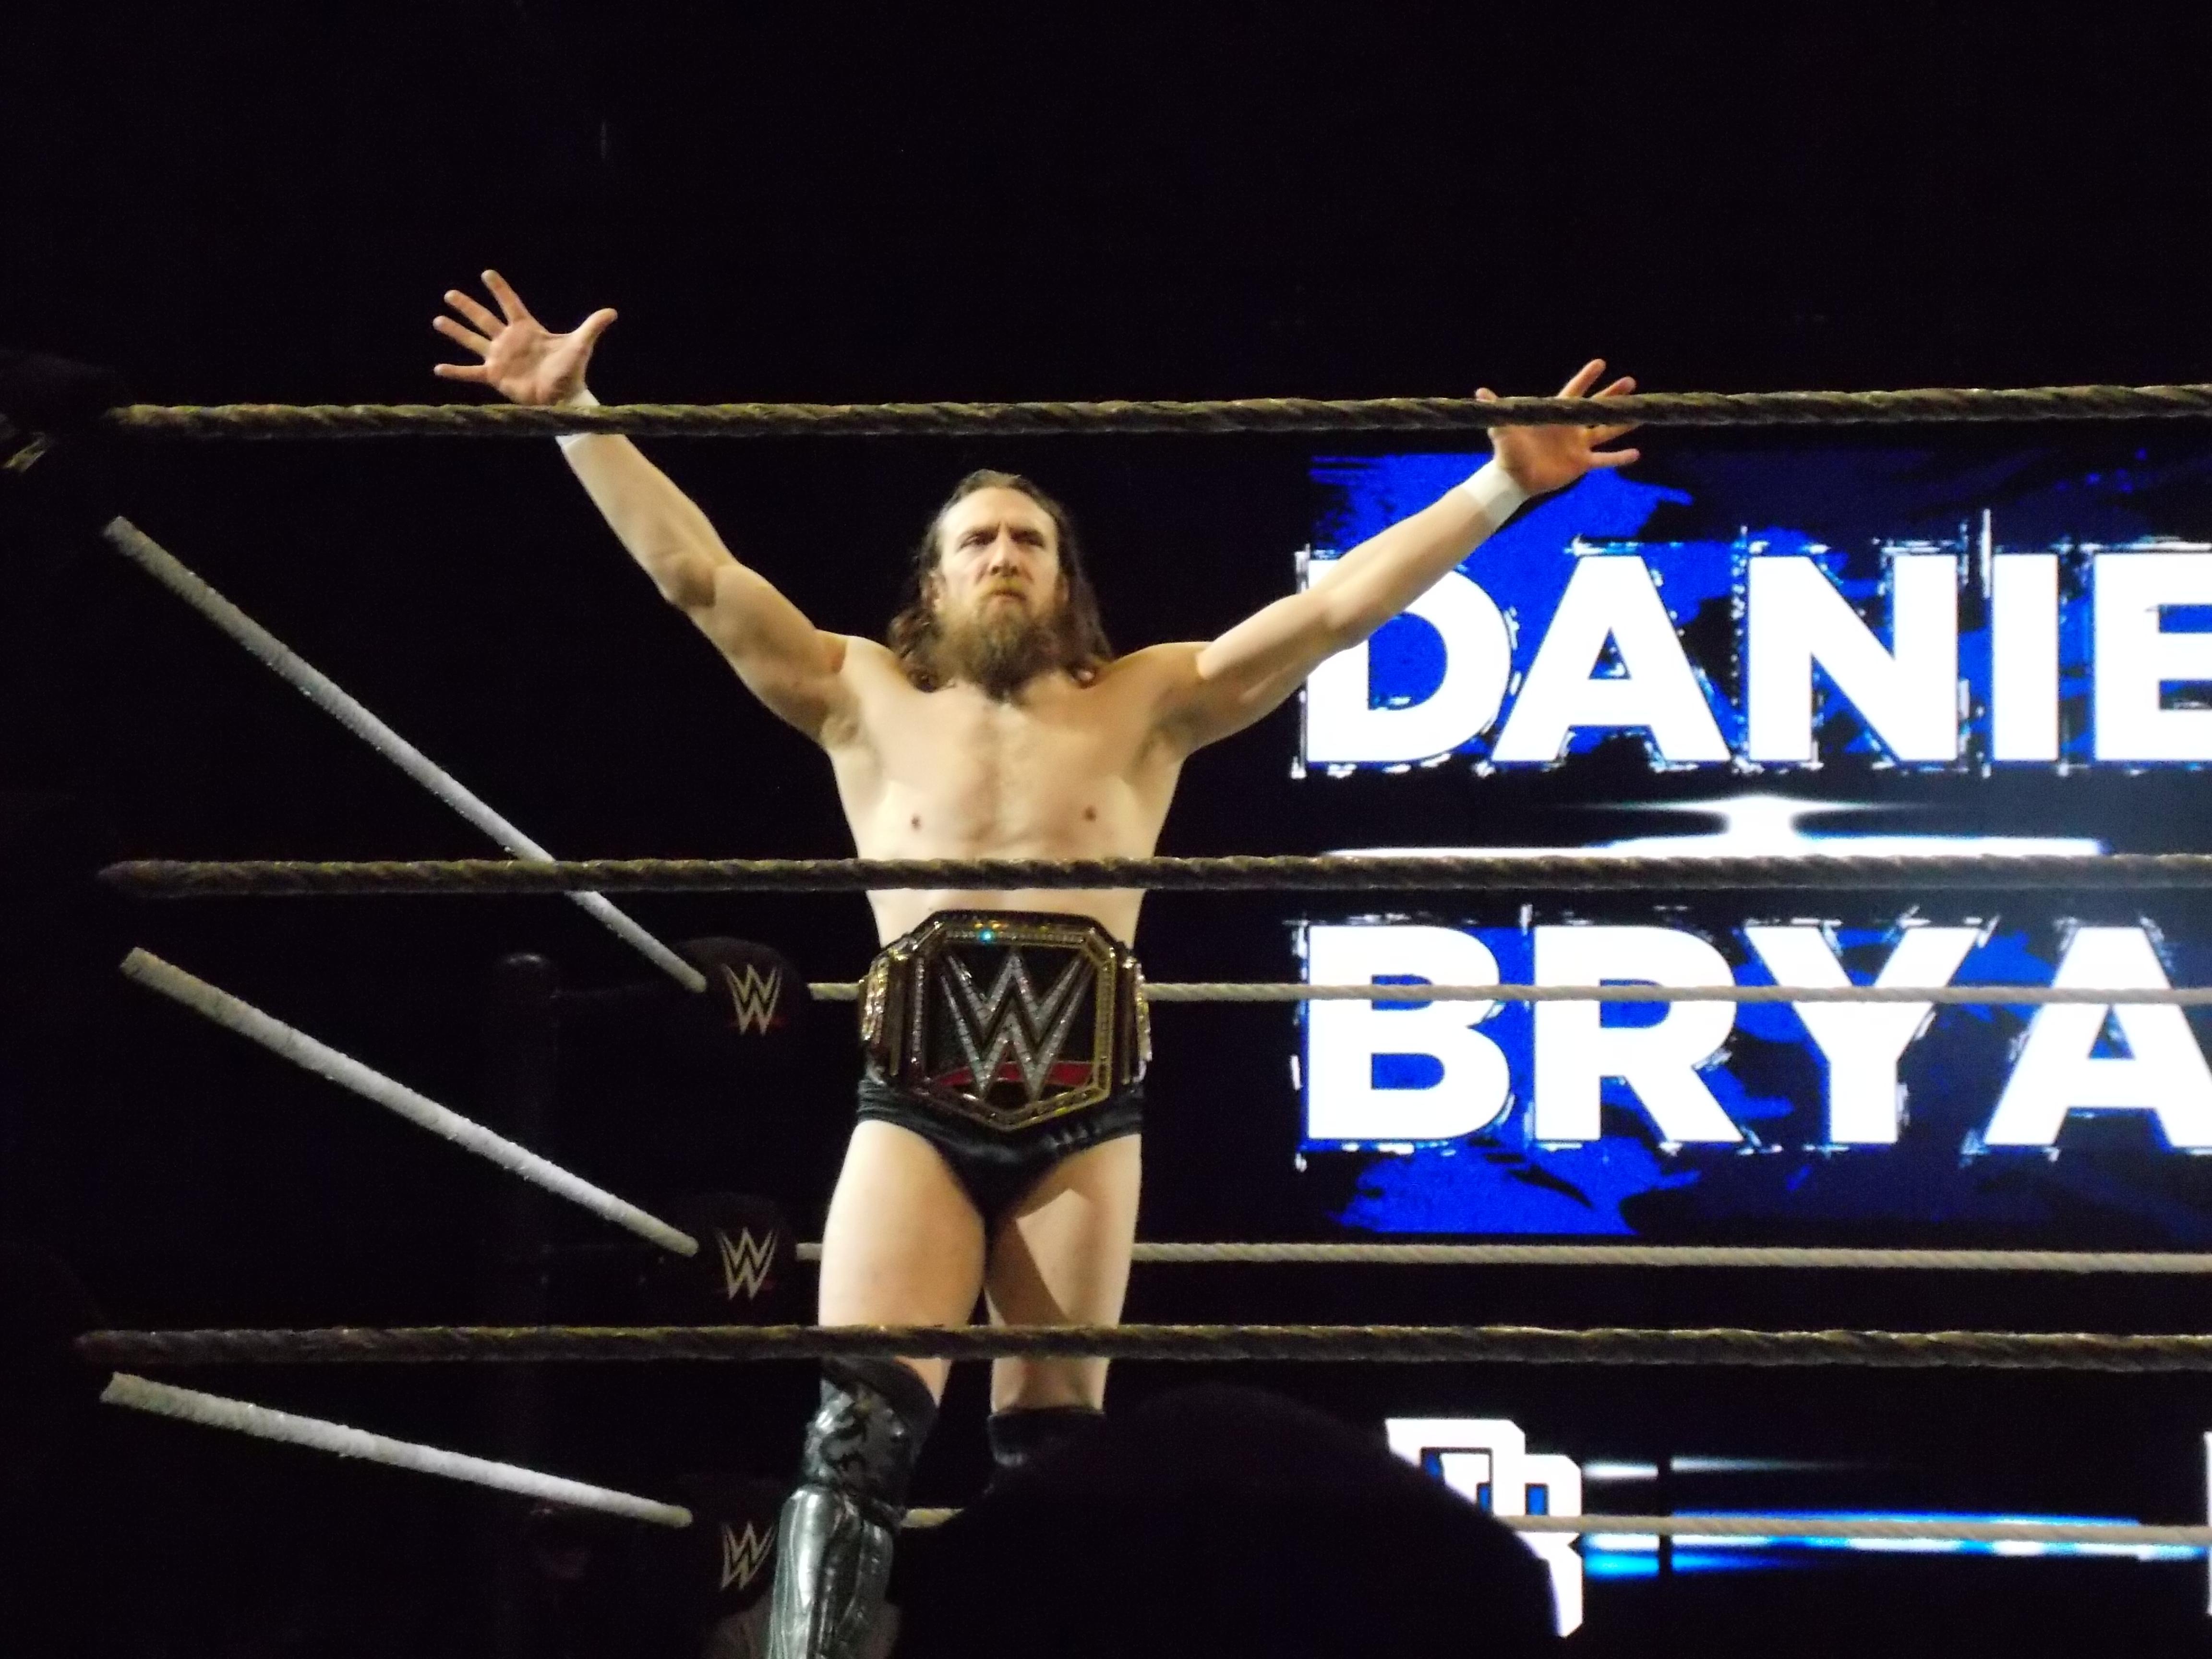 Report: Daniel Bryan Signs Deal With All Elite Wrestling, Debut Tentatively Set 1